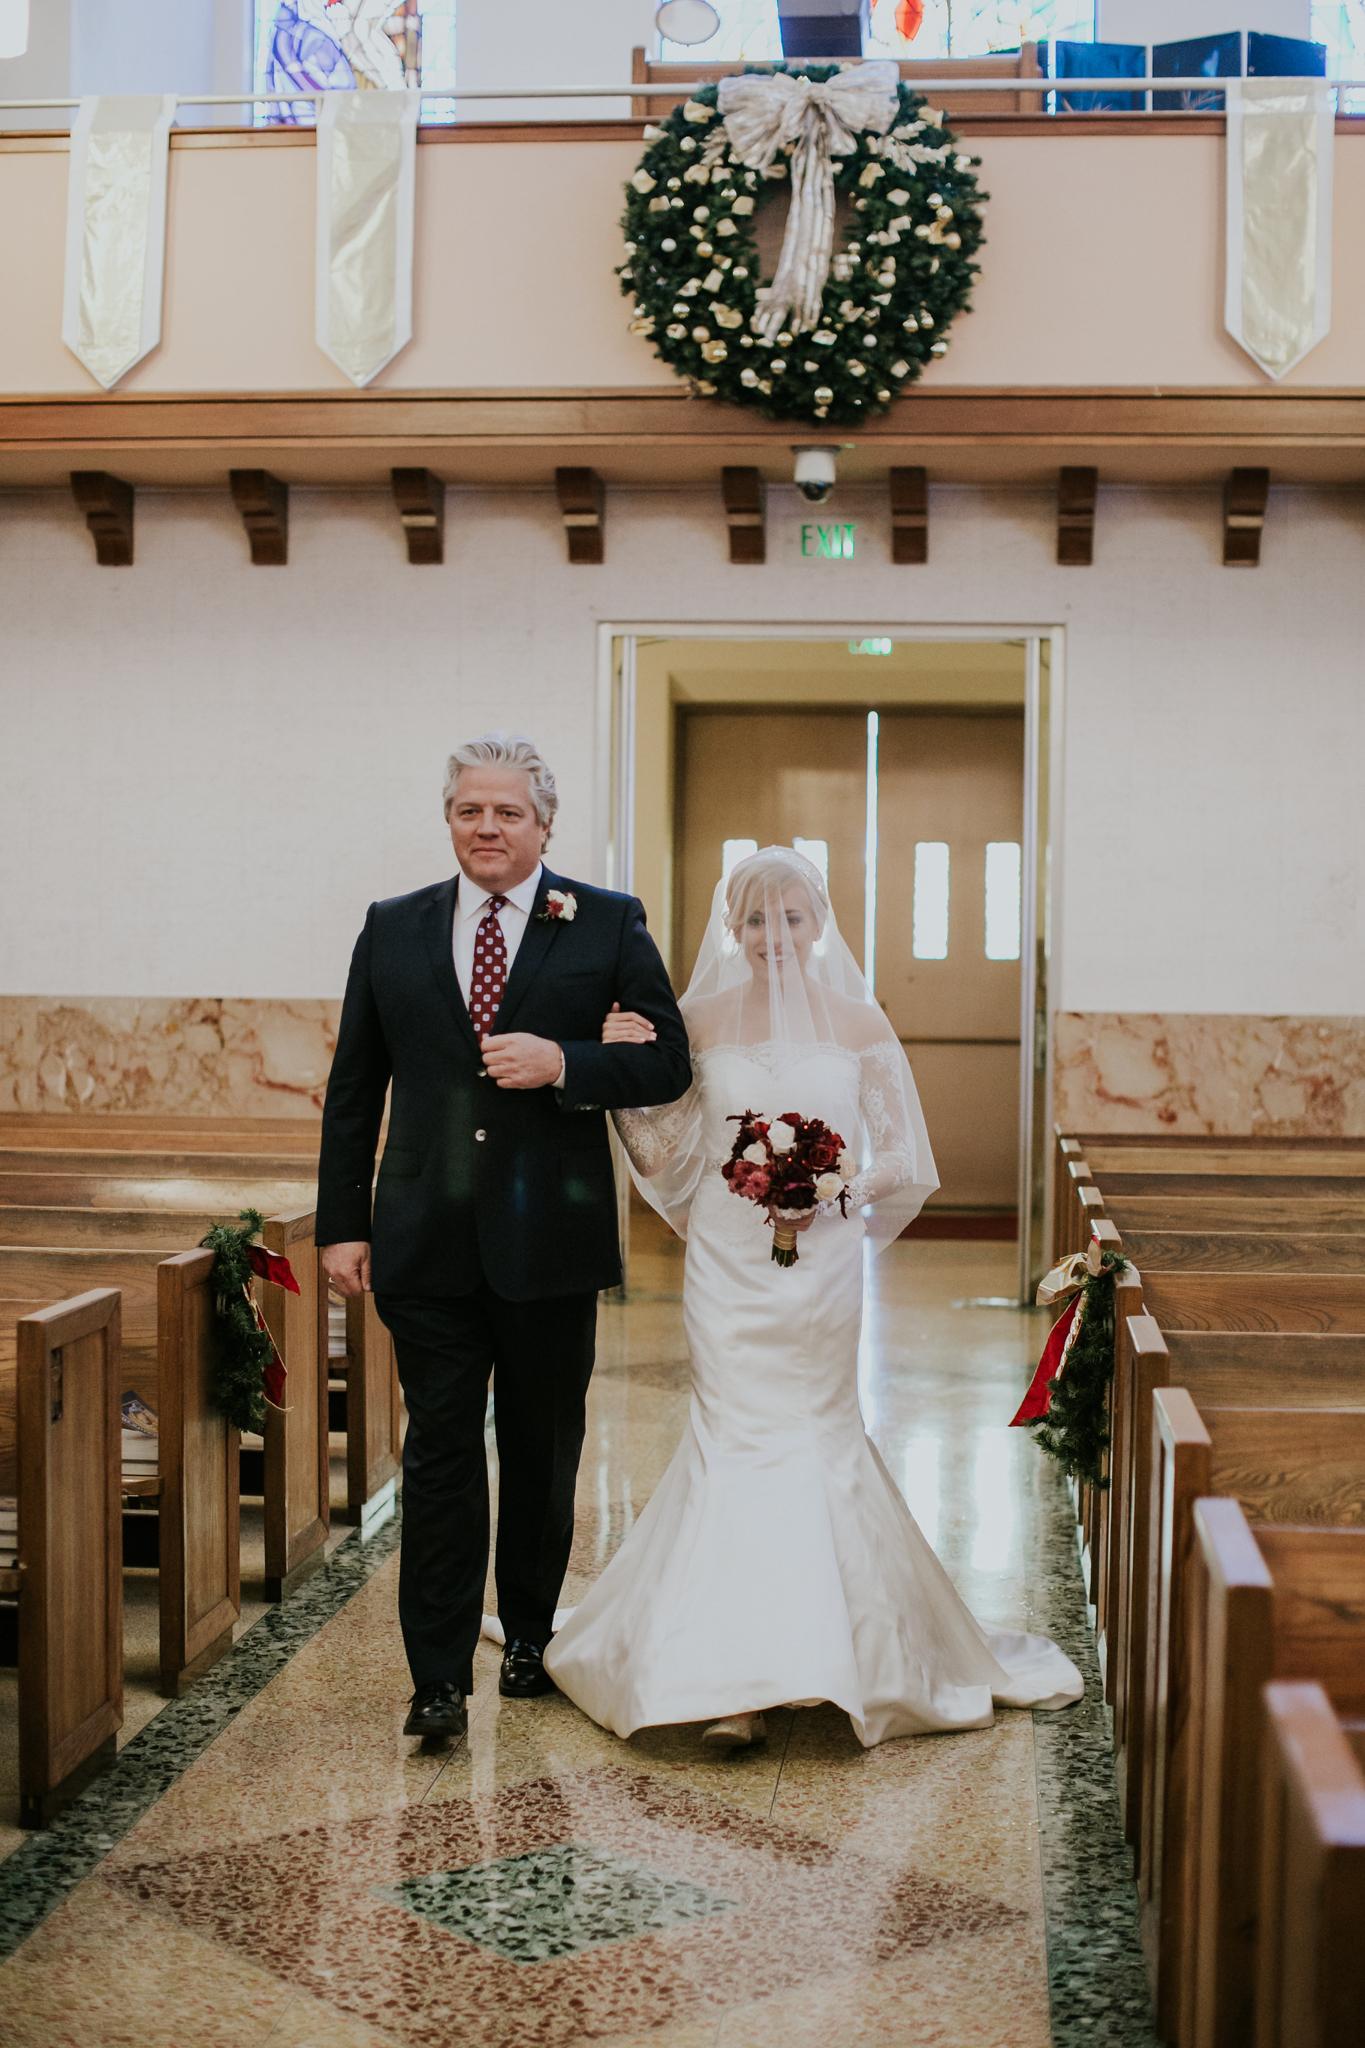 20151230_hussem_wedding_0370_web.jpg